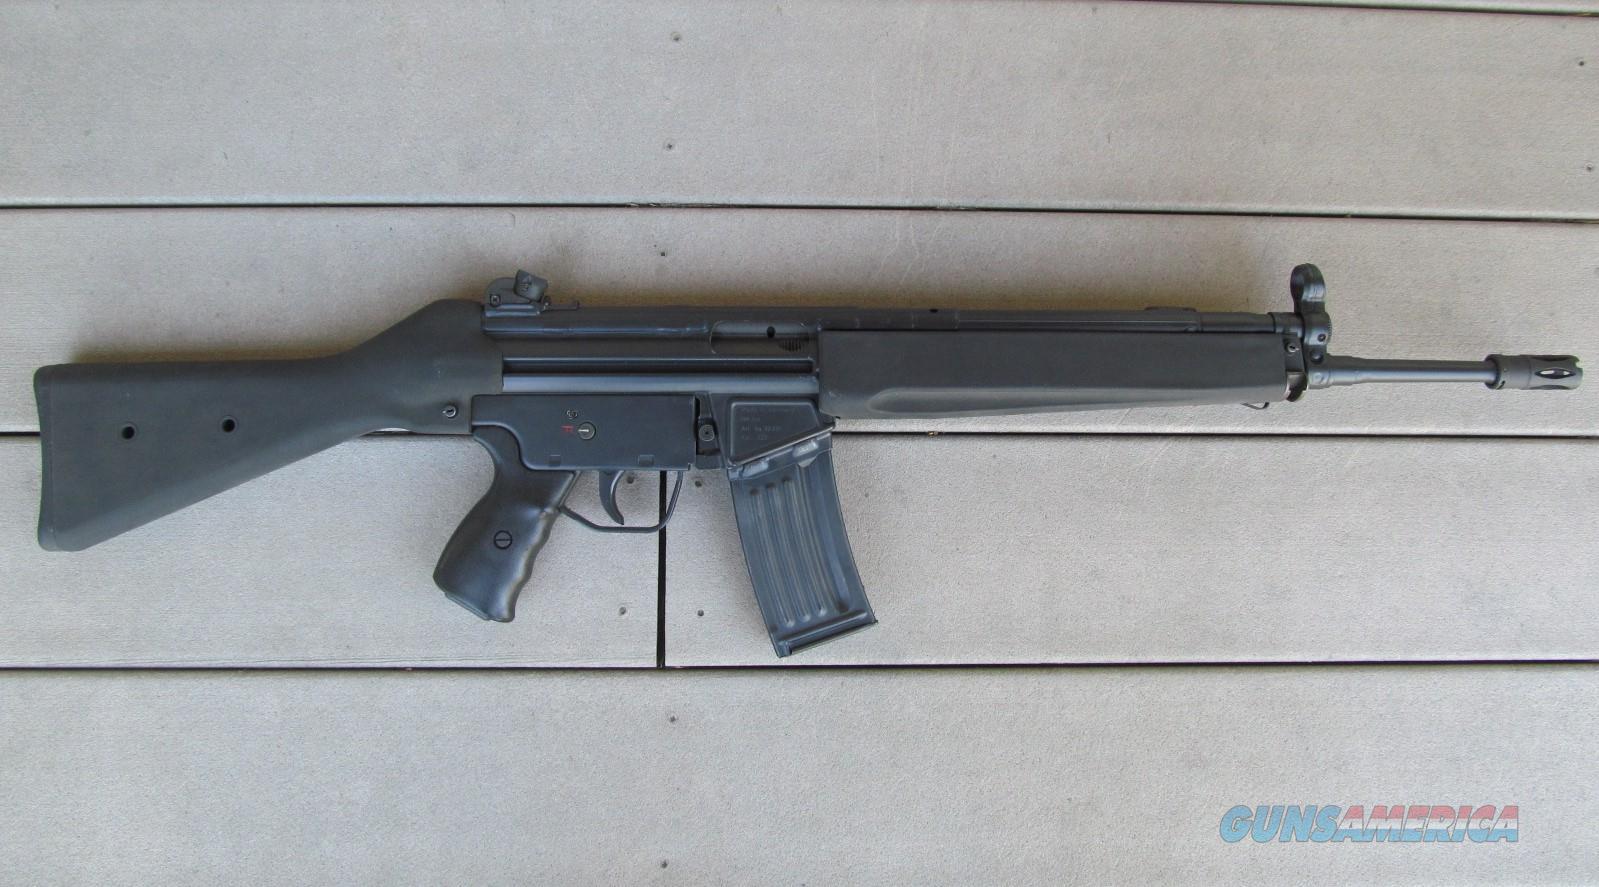 Genuine German HK93 Pre-ban  223 Assault Rifle (Heckler & Koch, H&K, 91,  mp5, 94, SP89, 93,